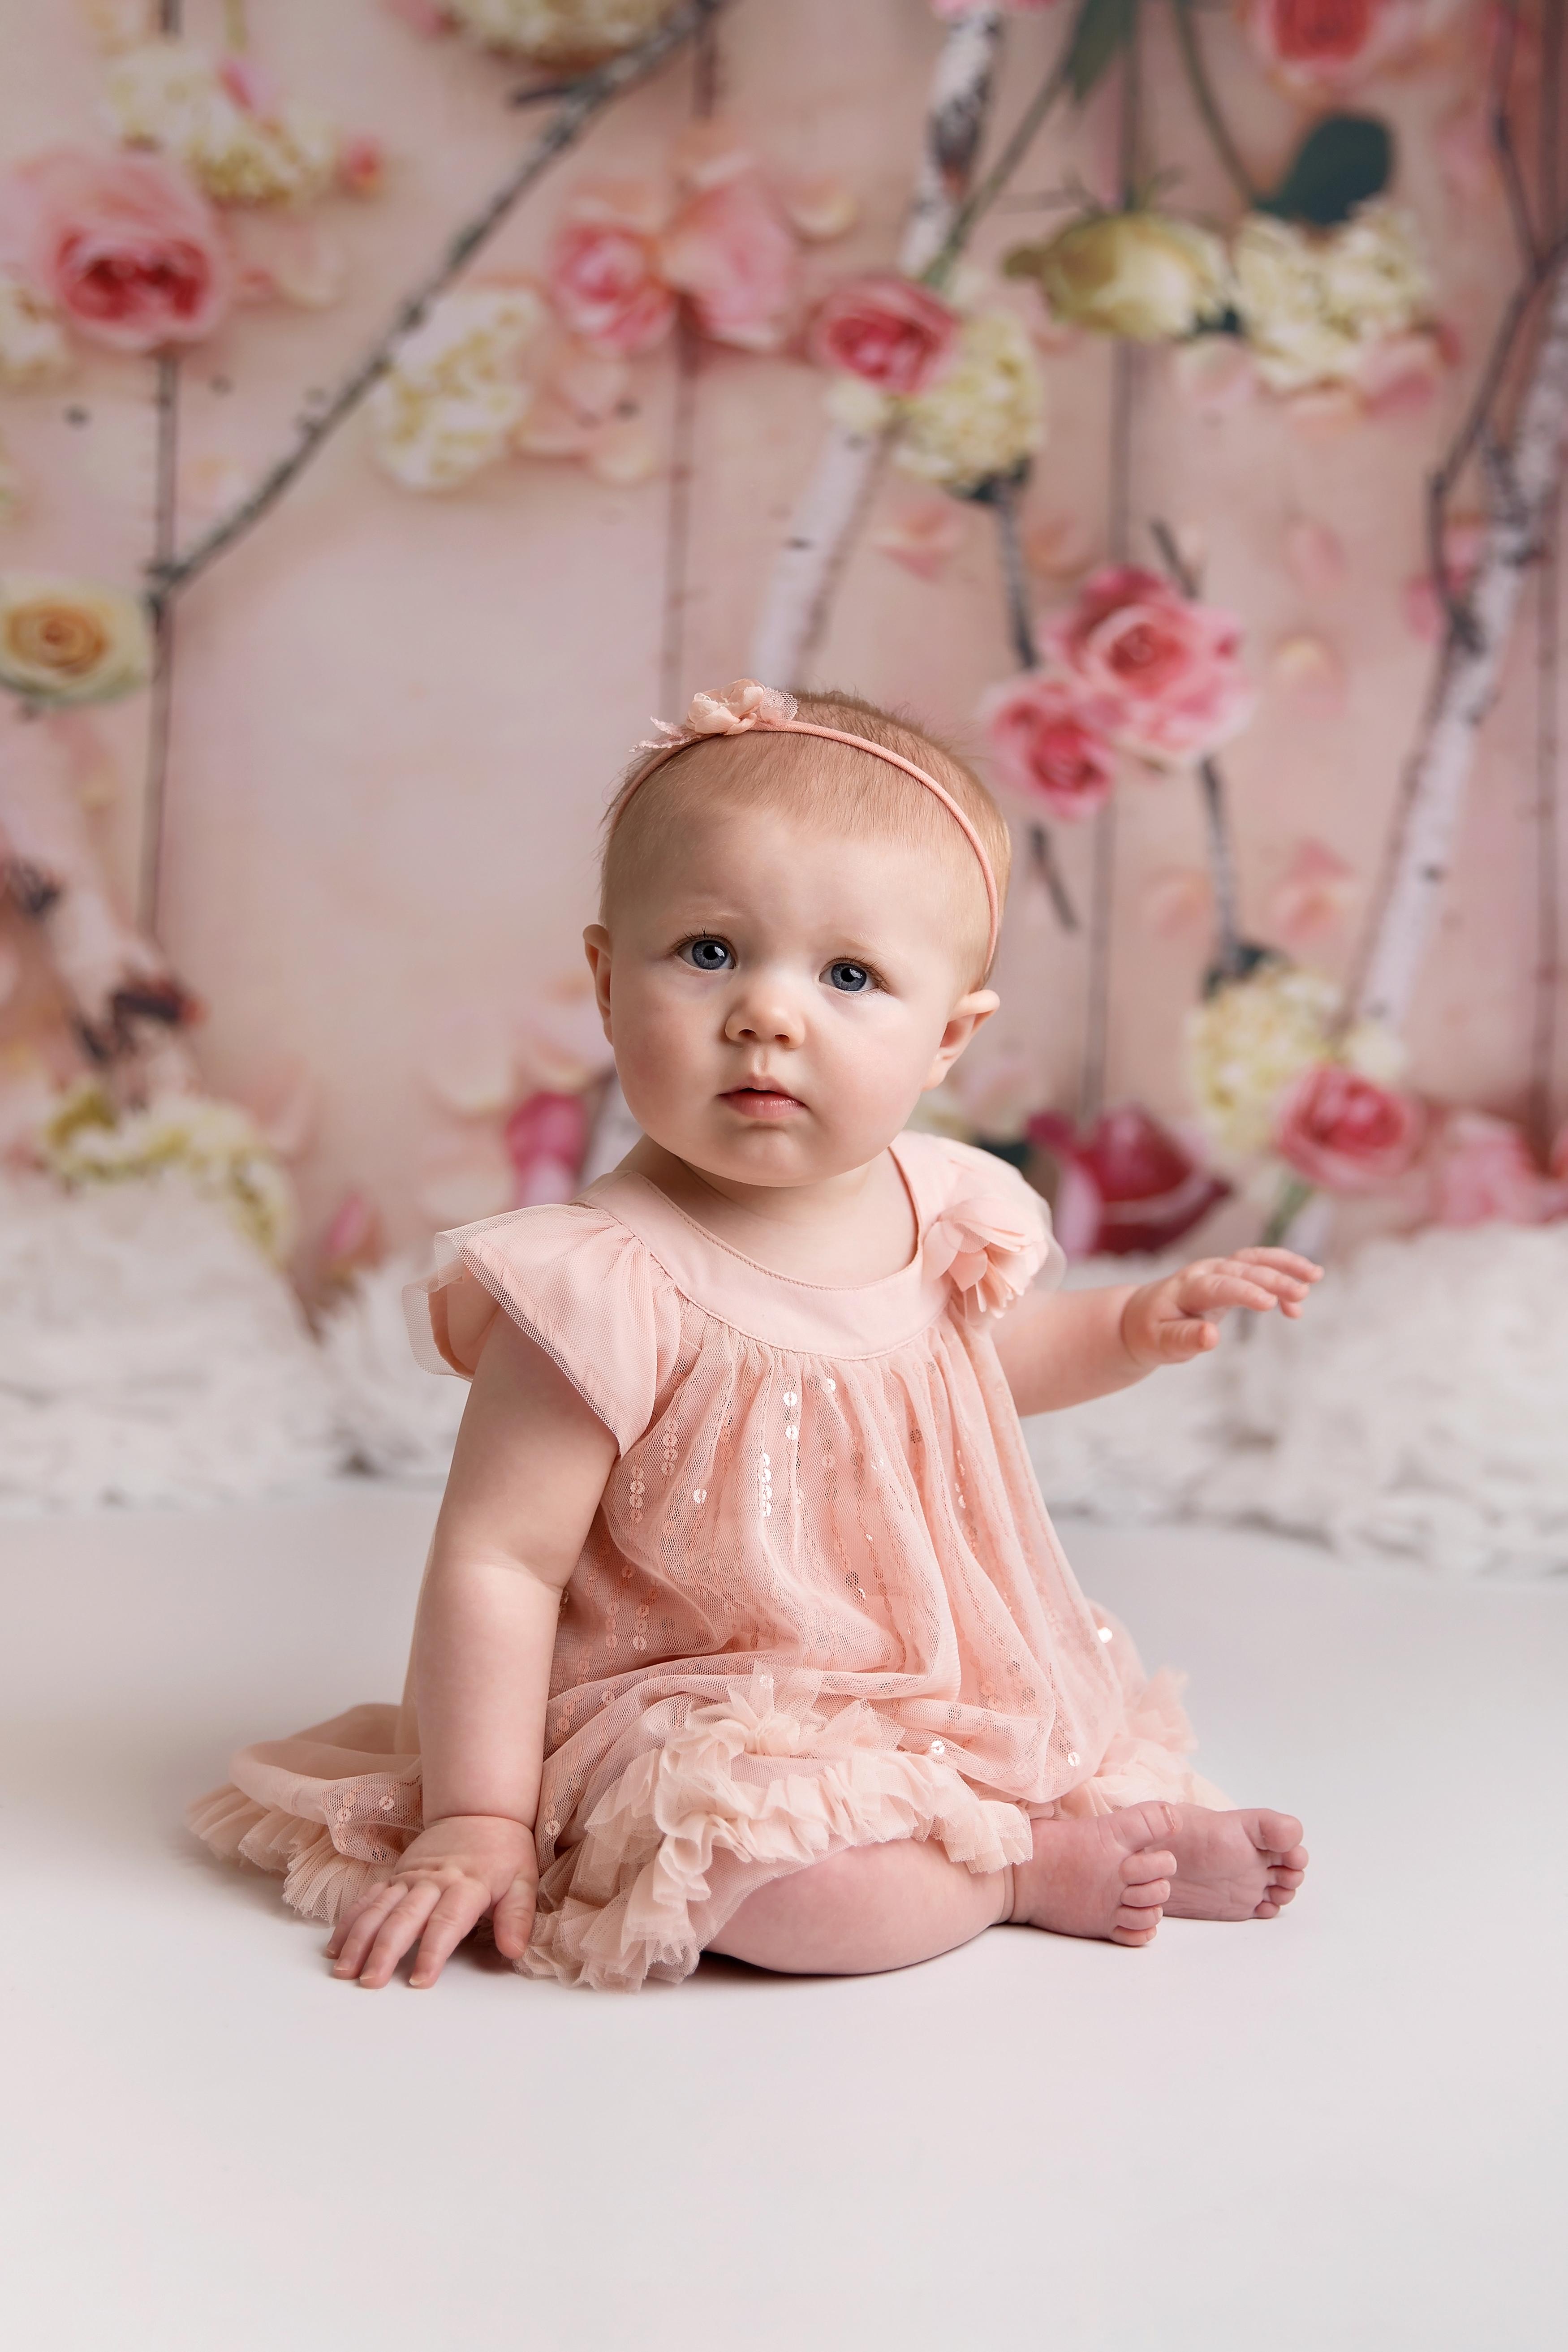 Telford baby photographers